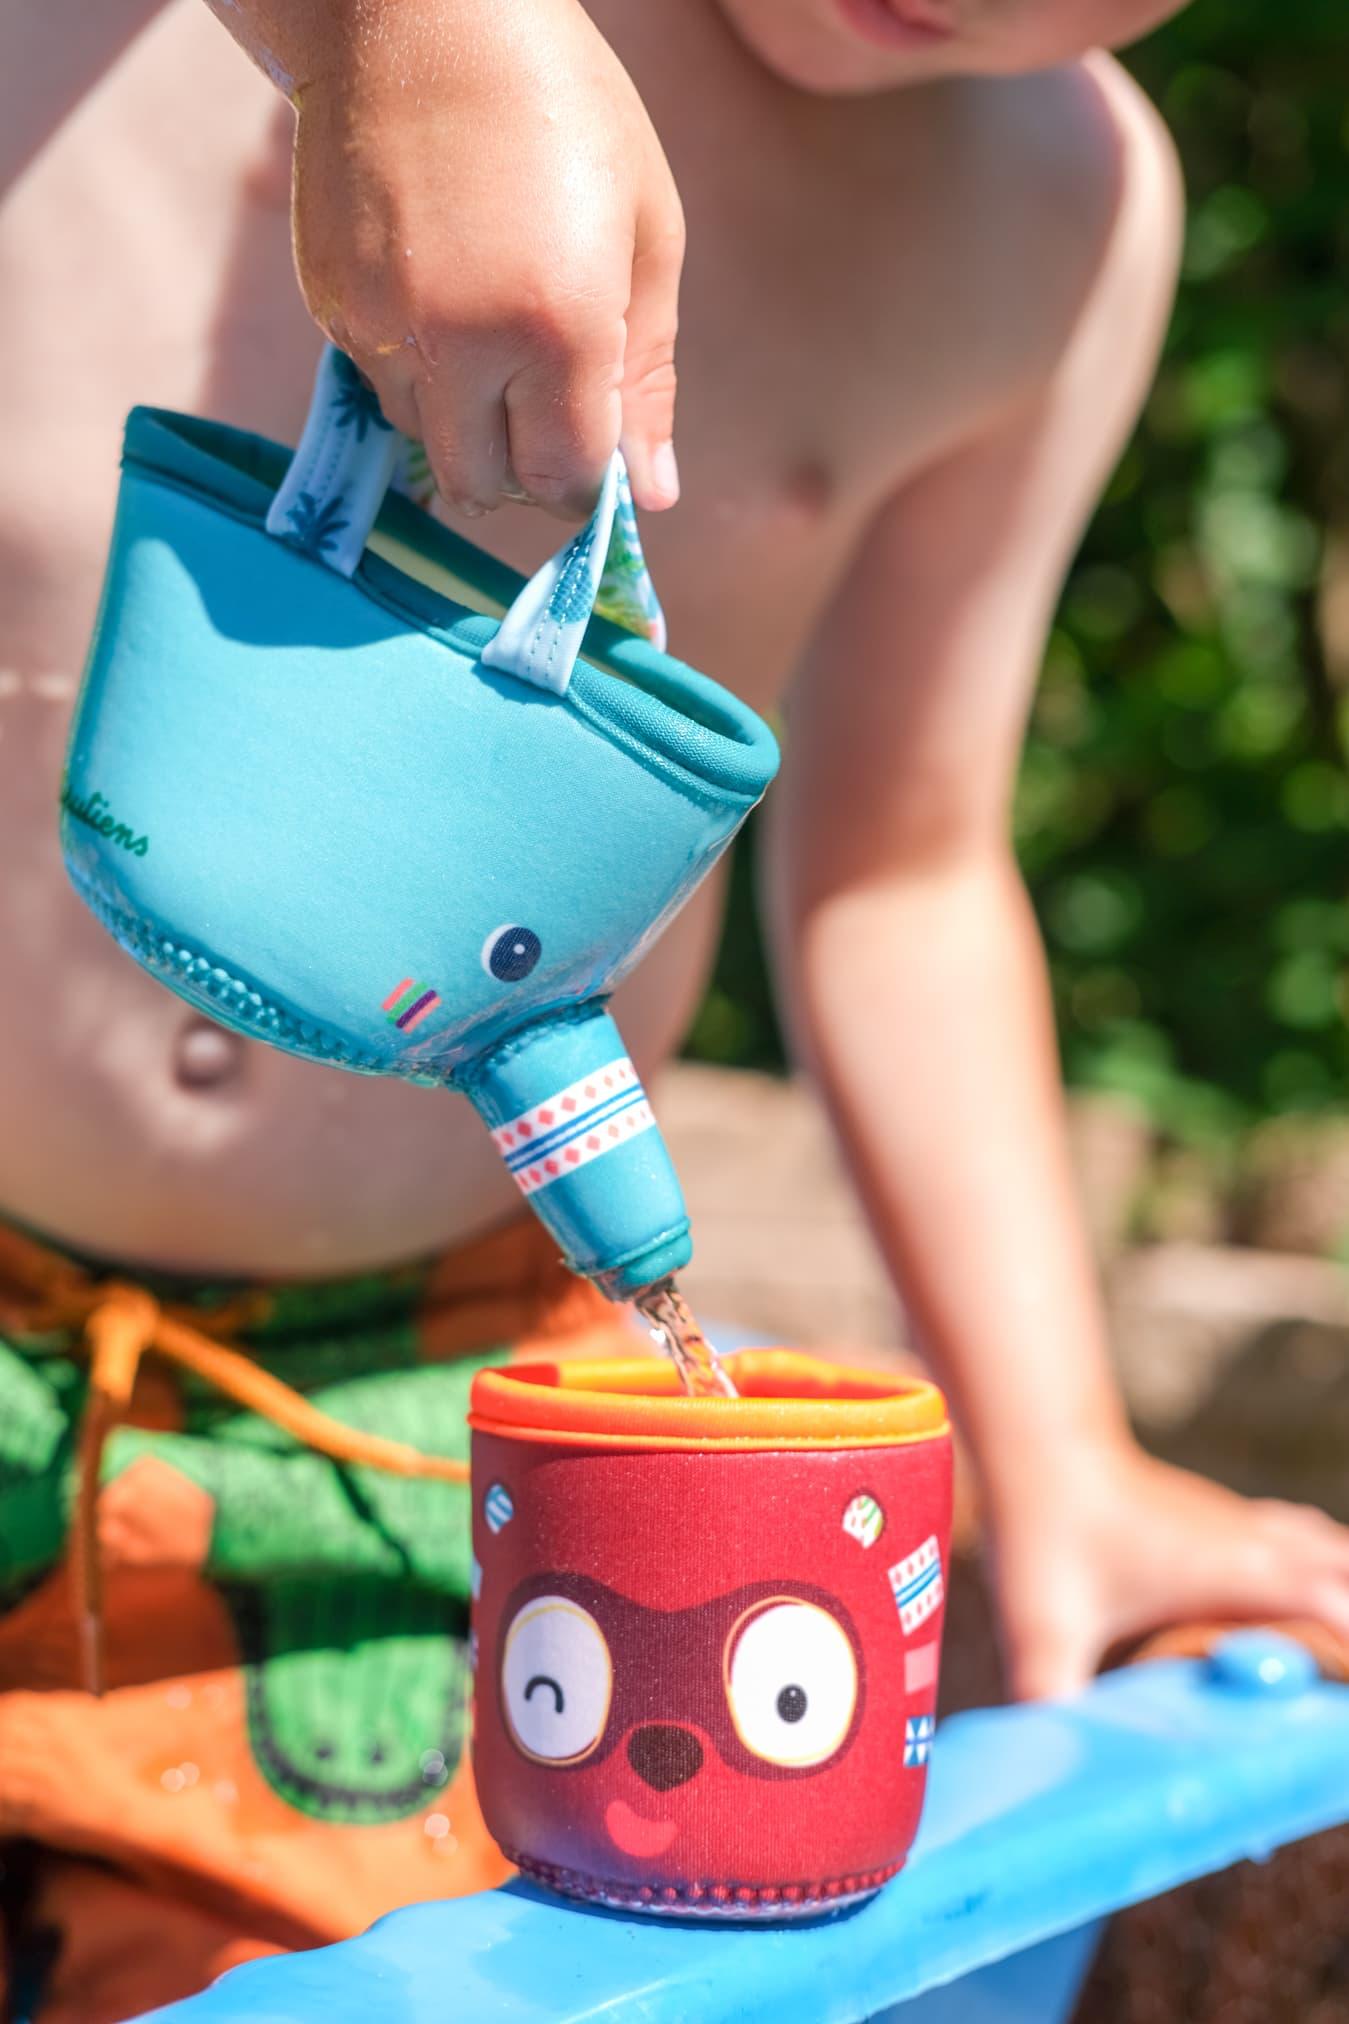 waterspeelgoed voor kleuters